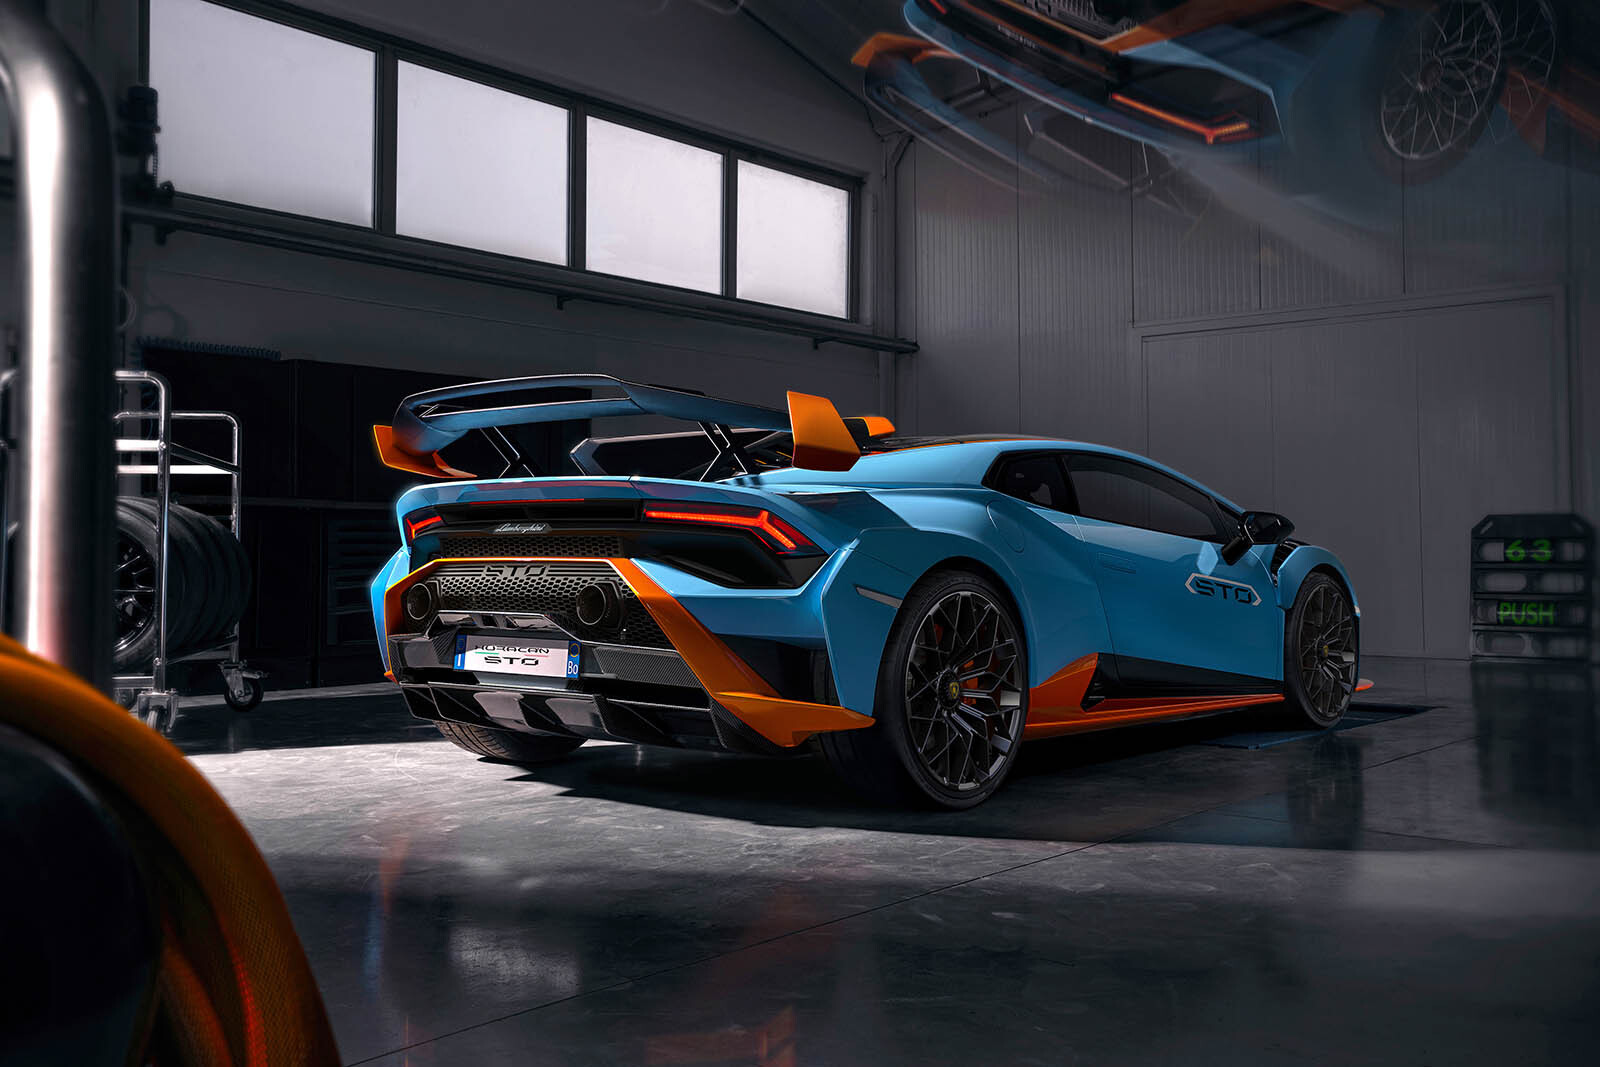 Lamborghini Huracán Super Trofeo Omologata